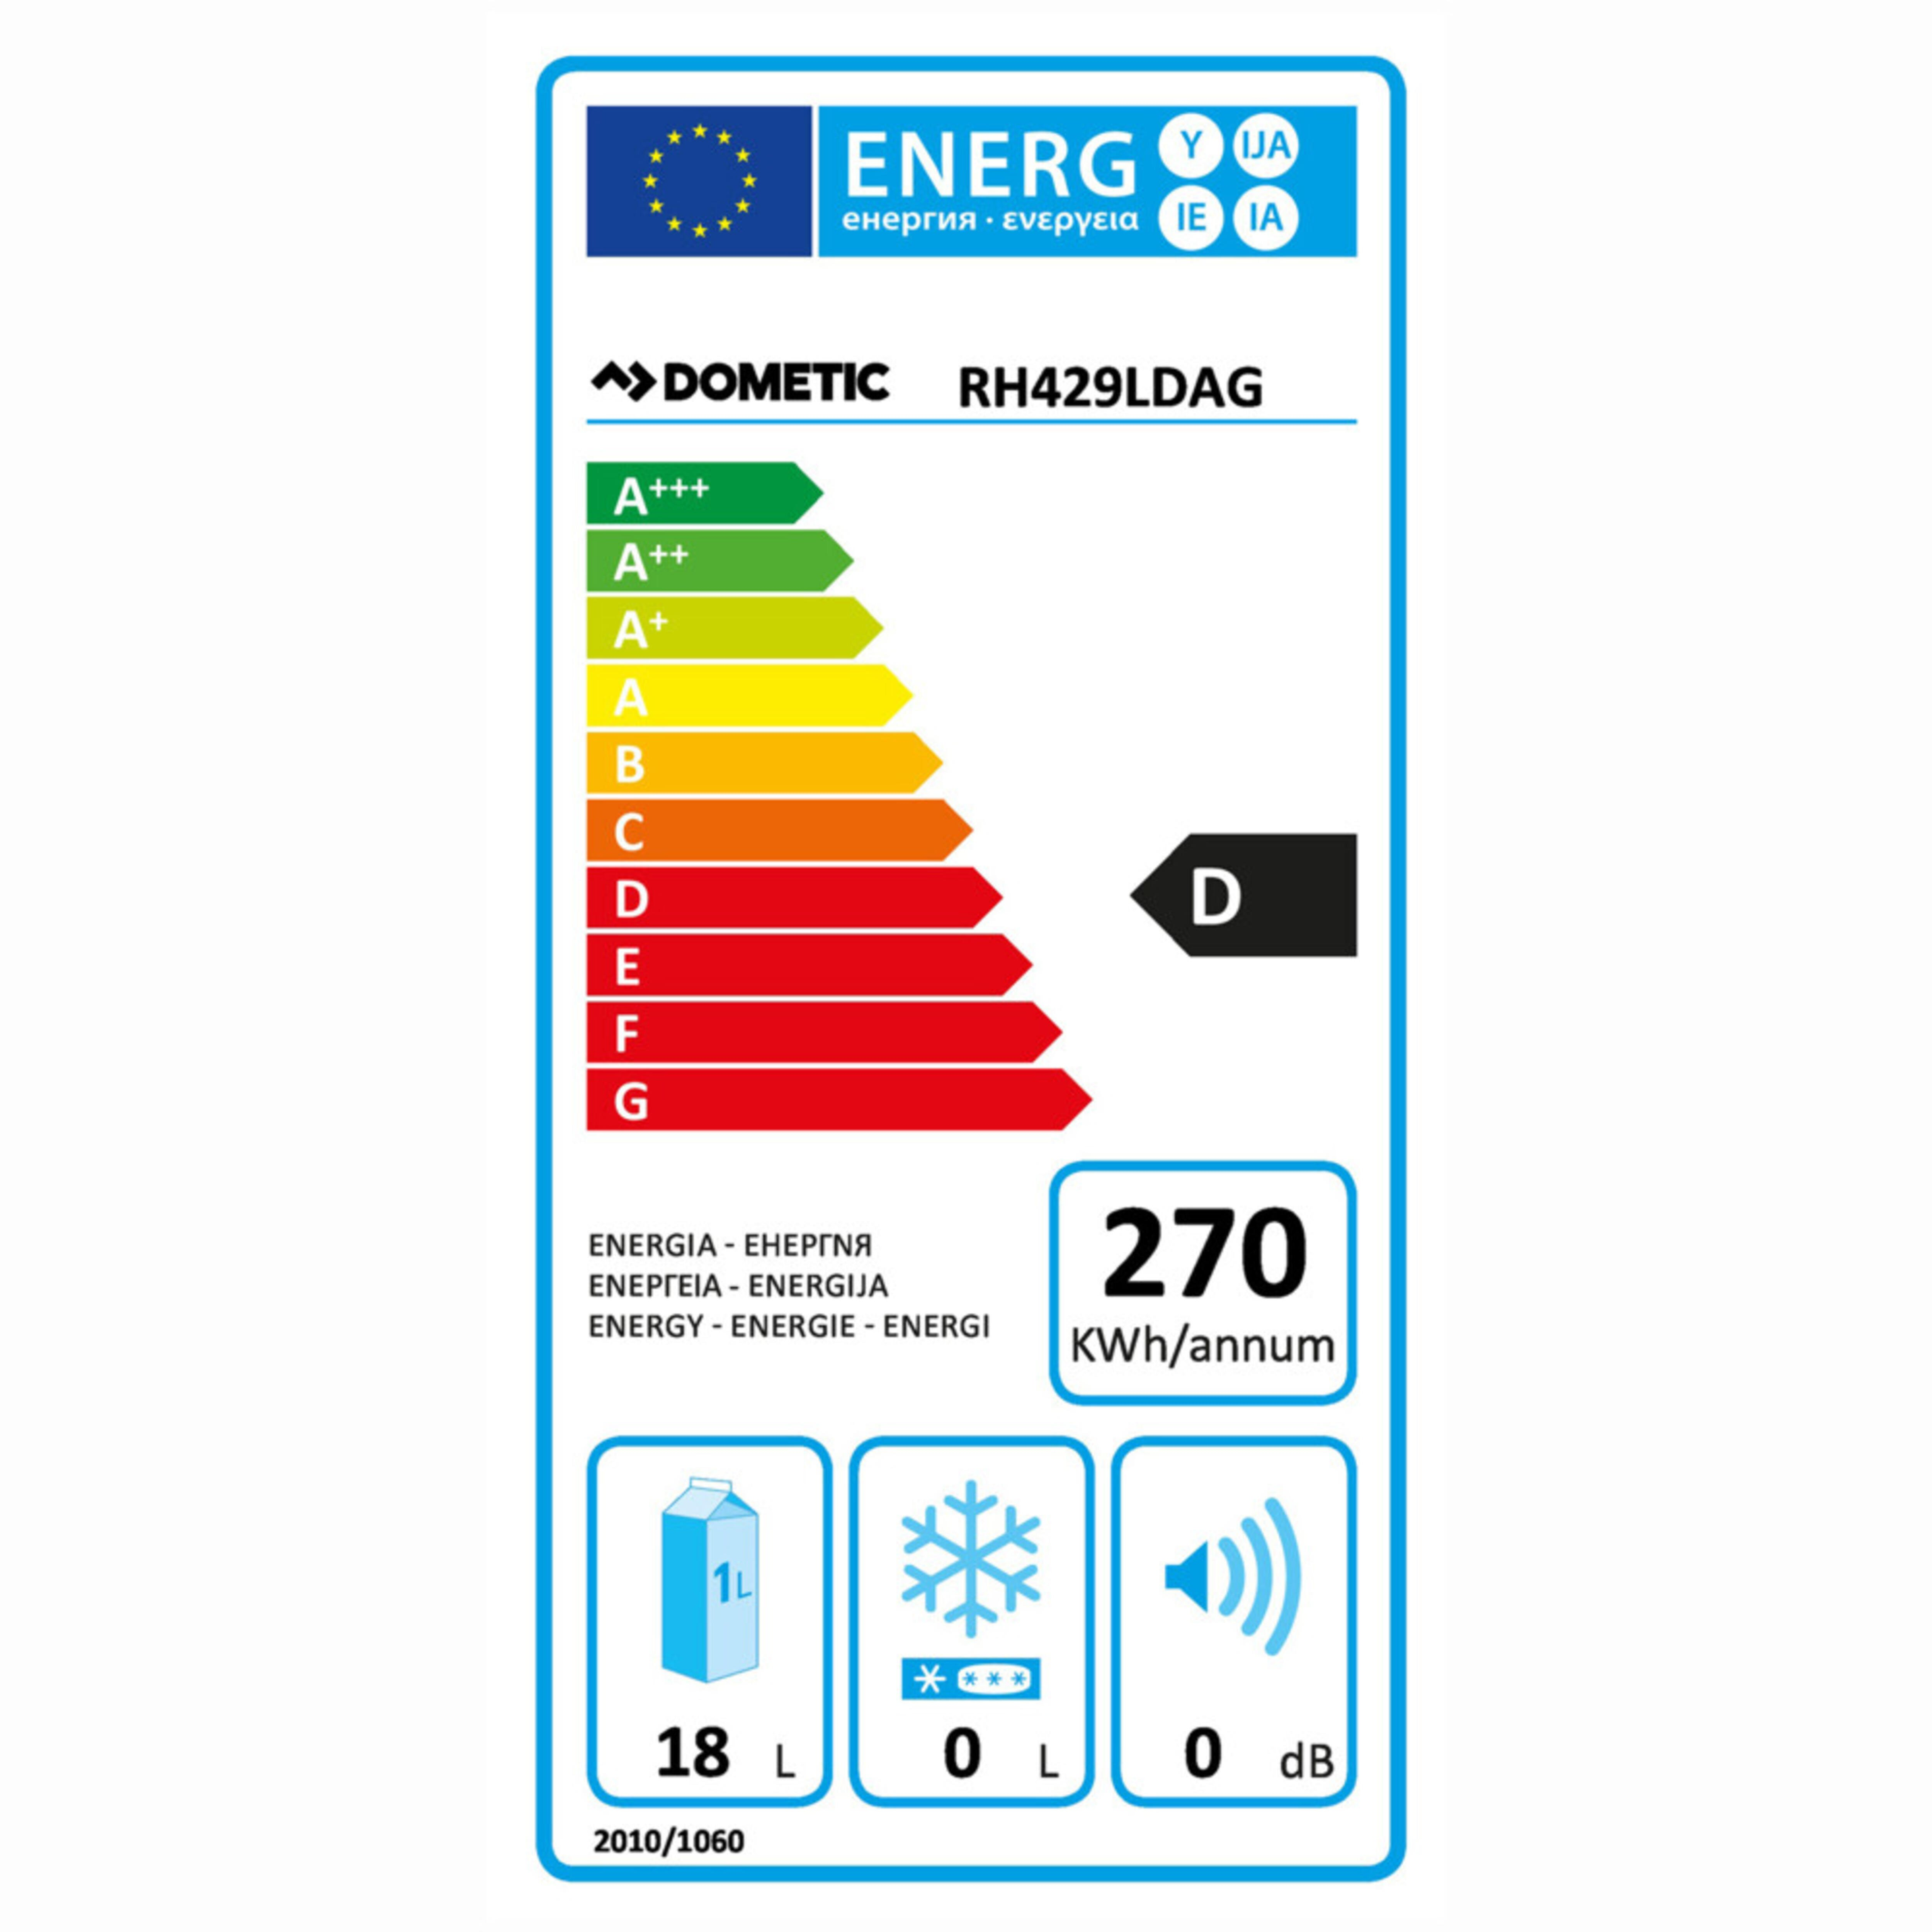 Dometic RH 429 LDAG Energiamerkki